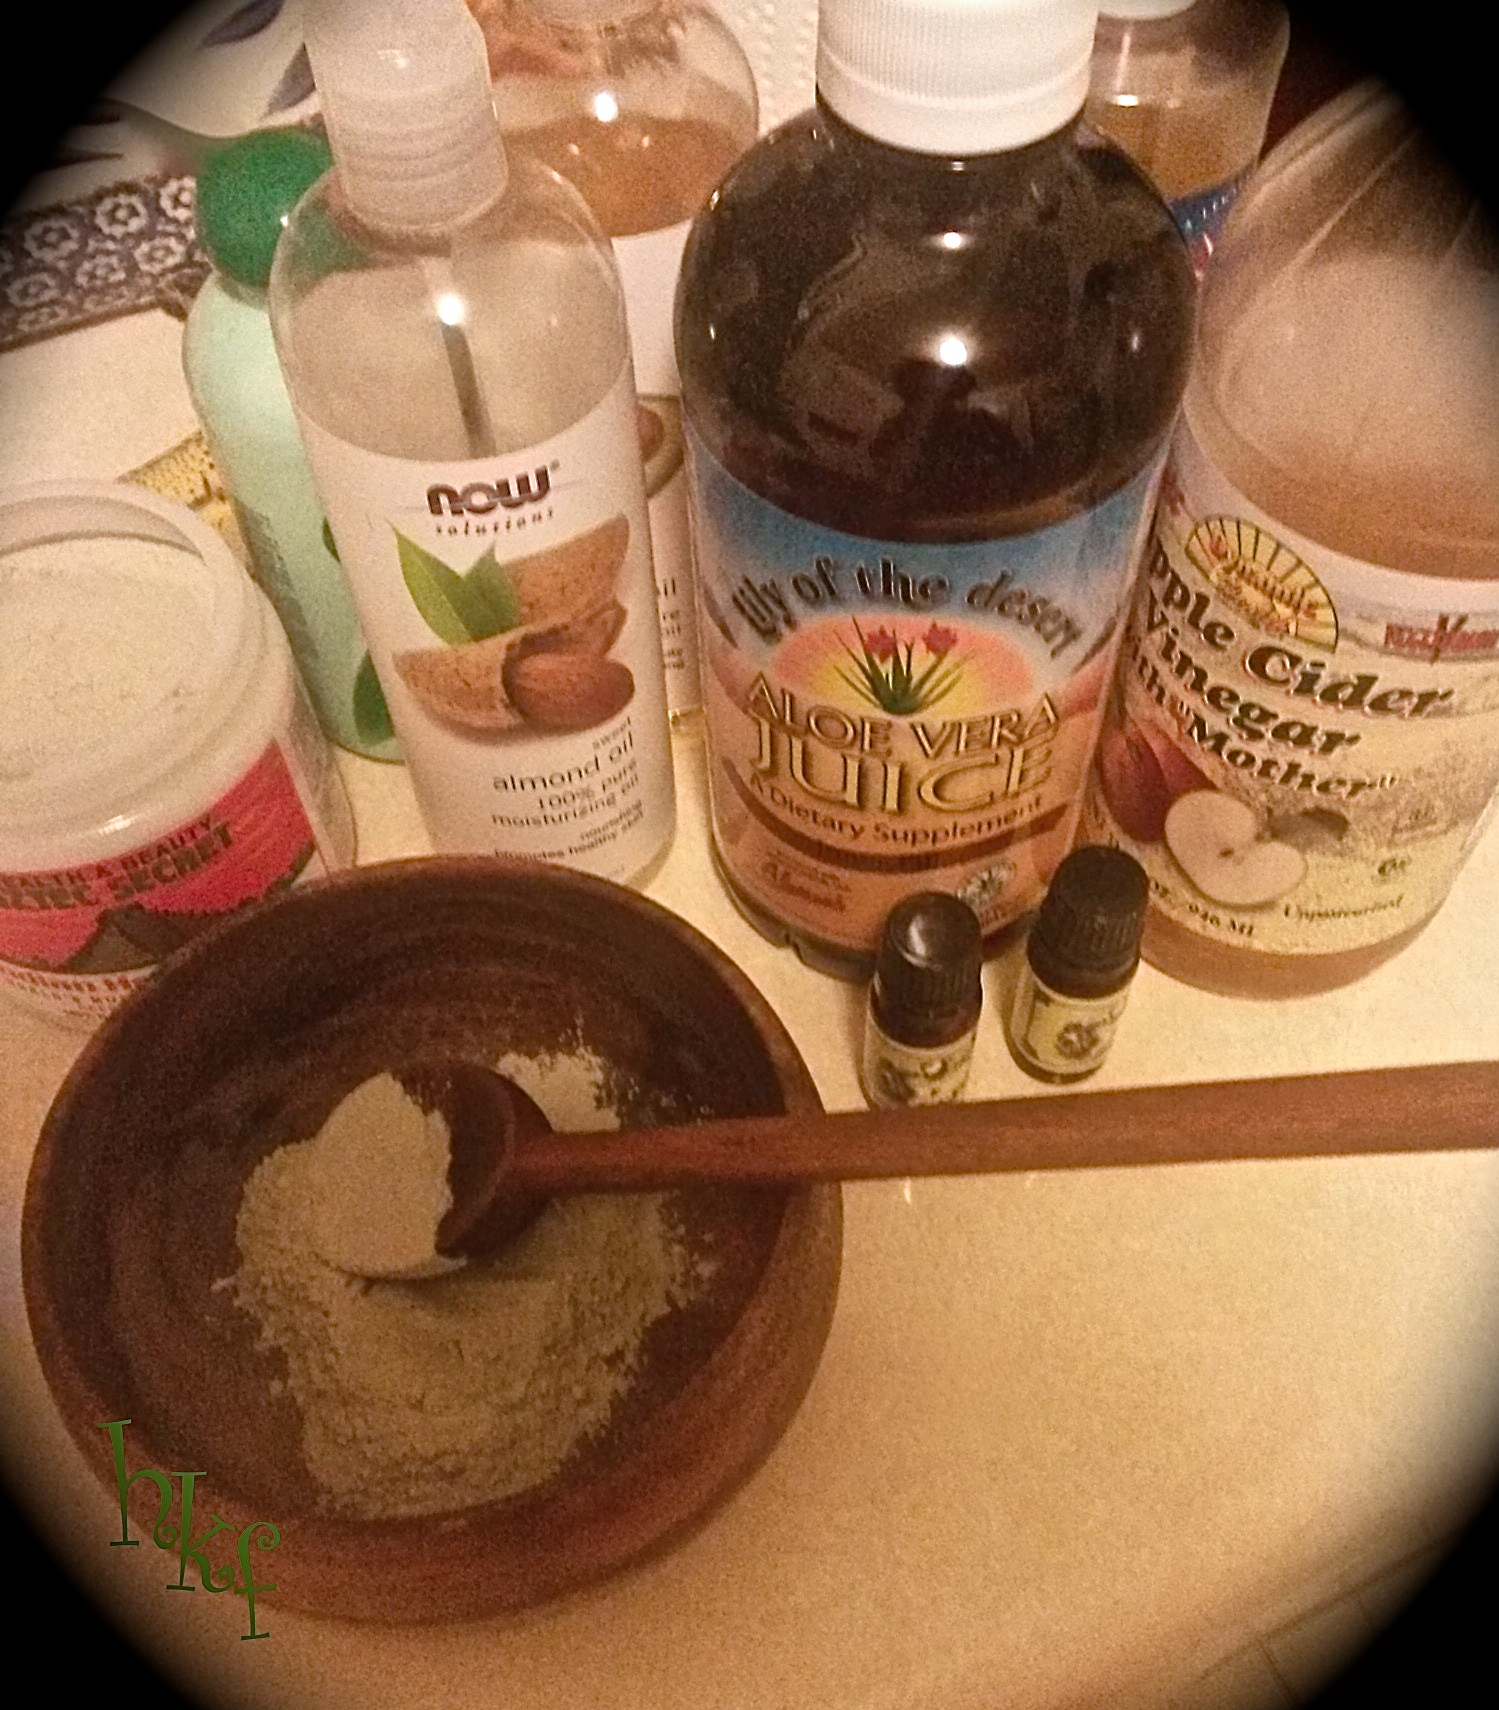 DIY Aloe Vera Mud Wash *Natural Hair* | Happy Kinks Forever's